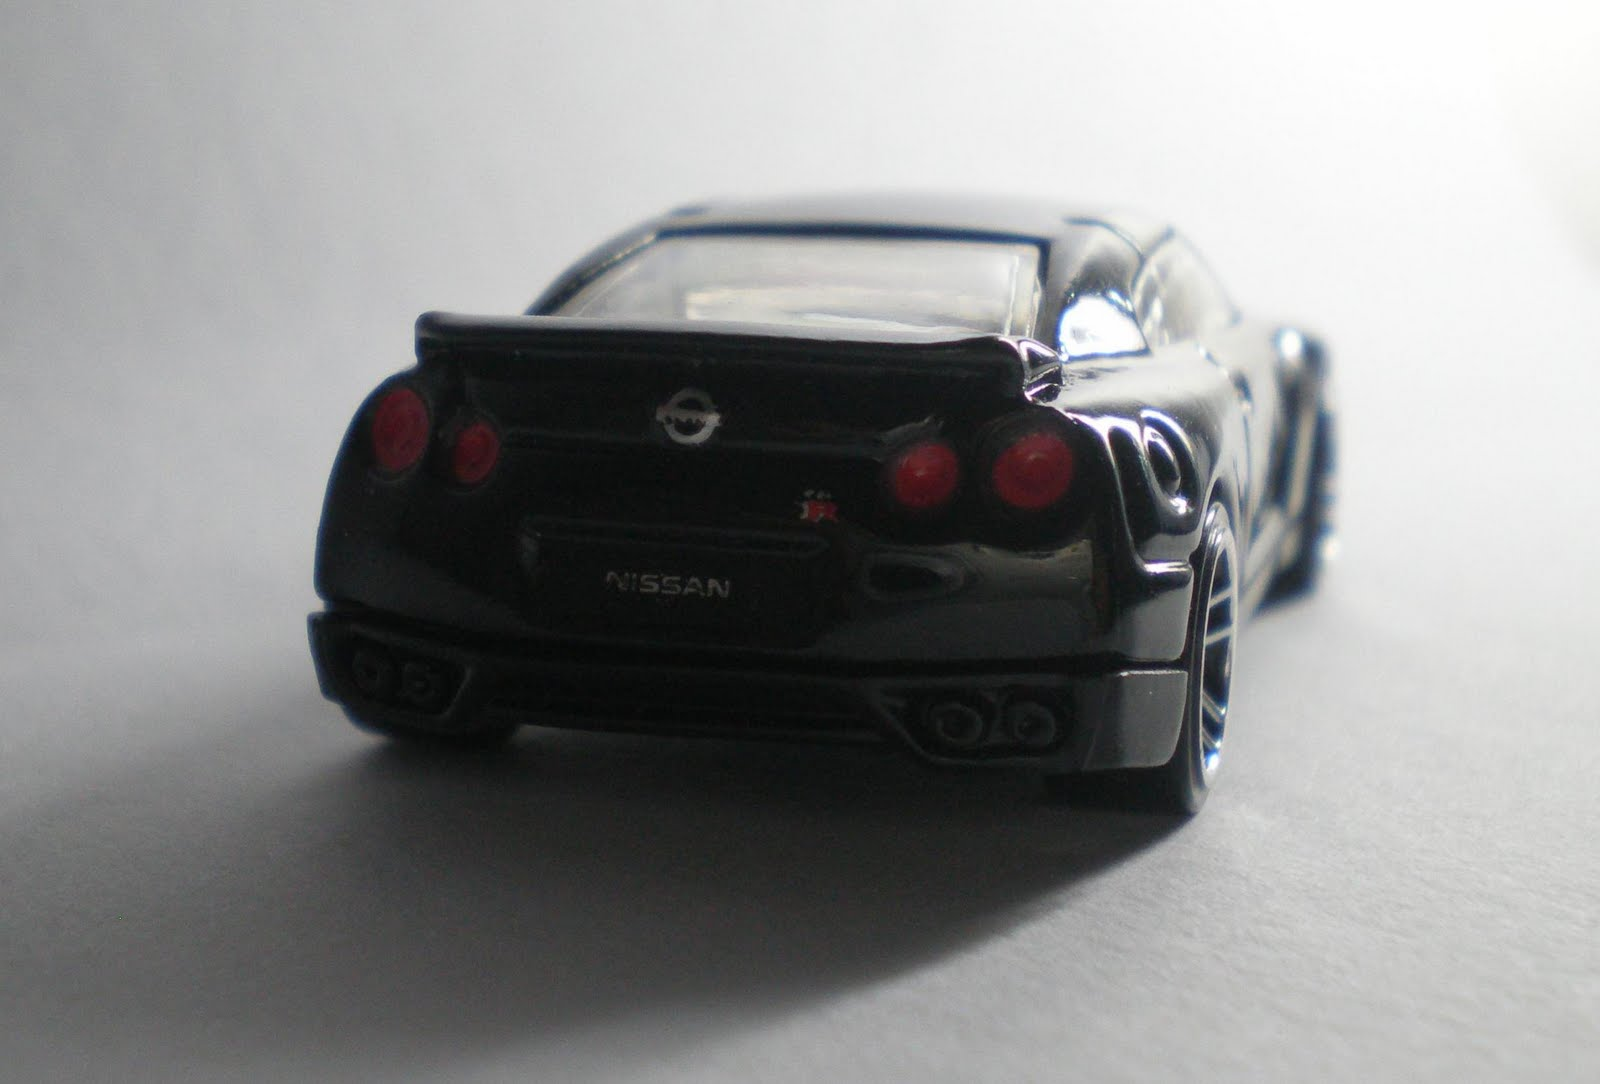 2009 nissan gtr manual transmission